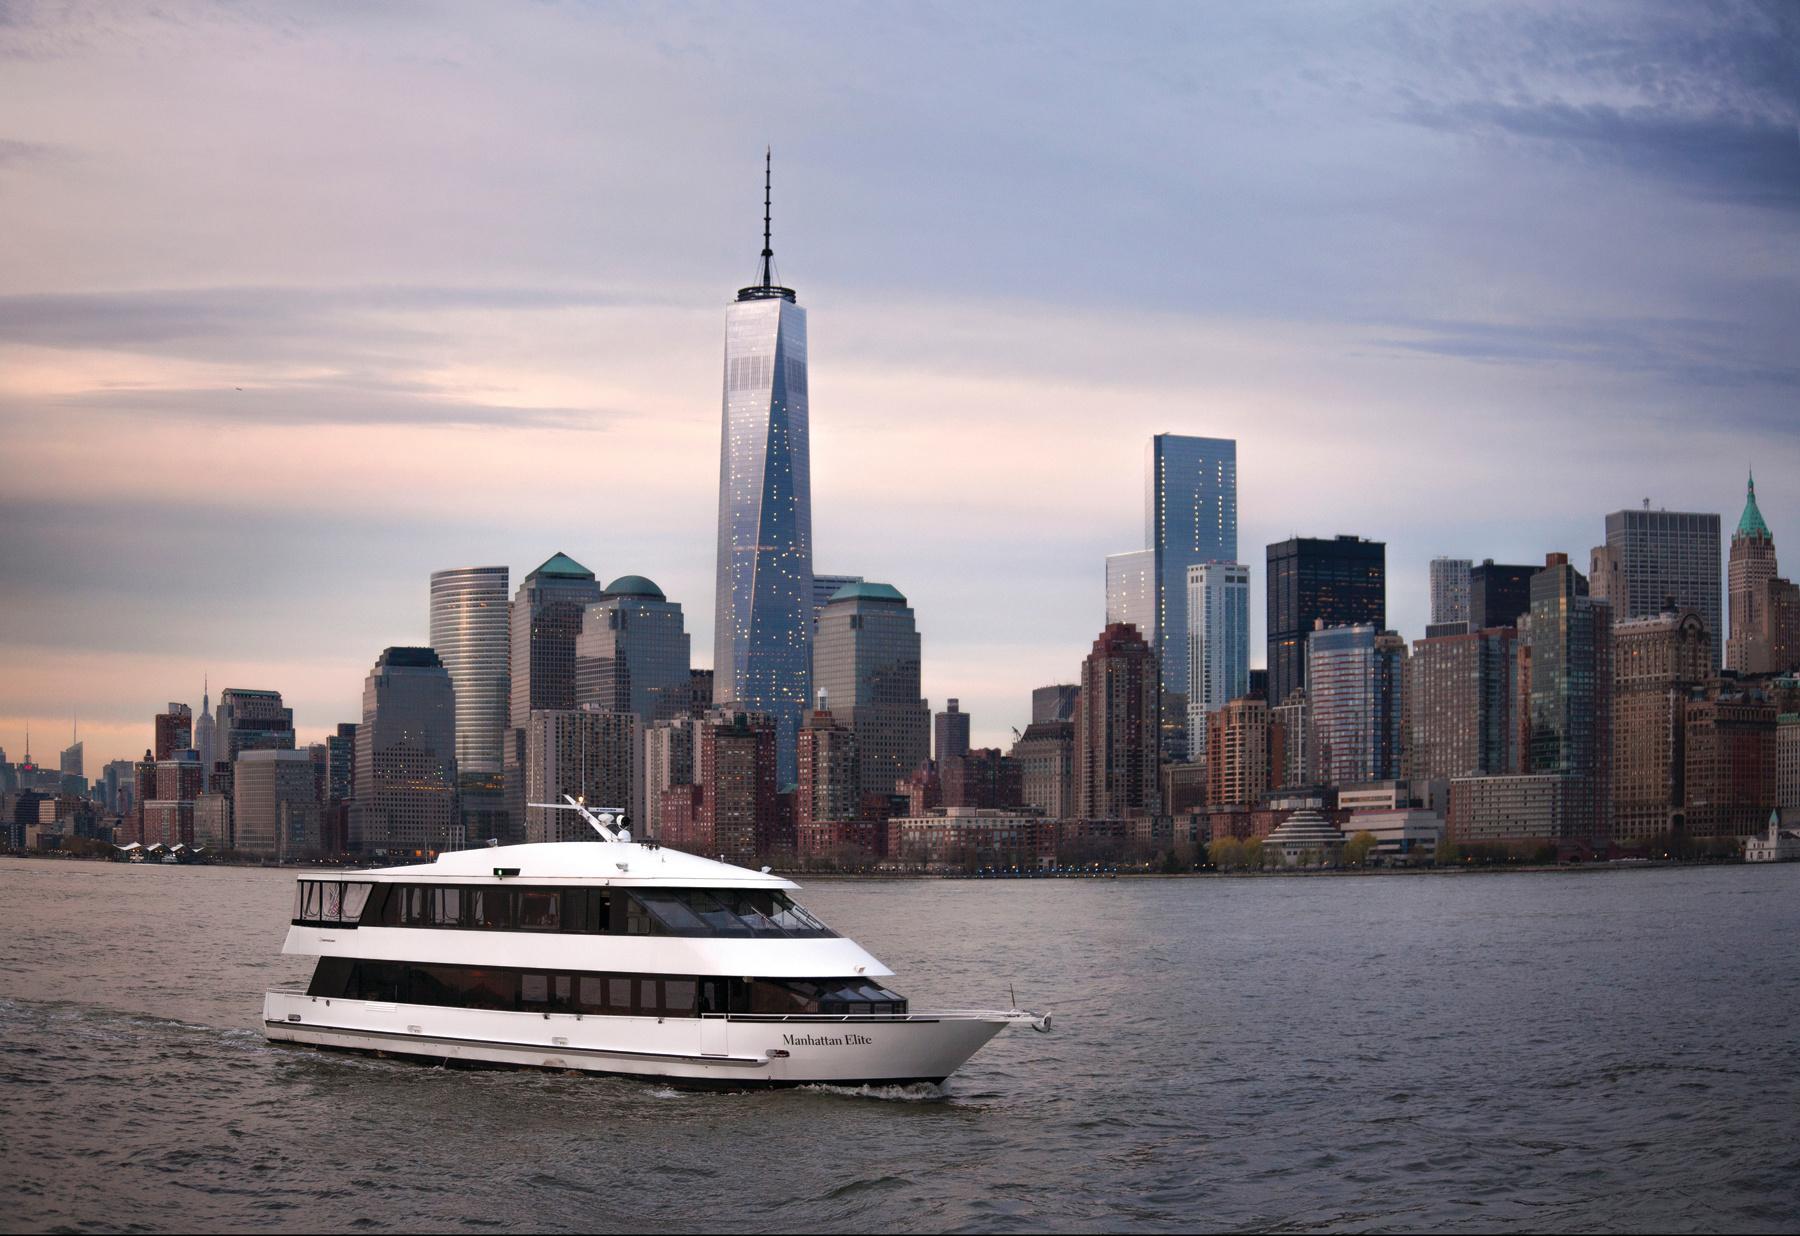 Manhattan Elite